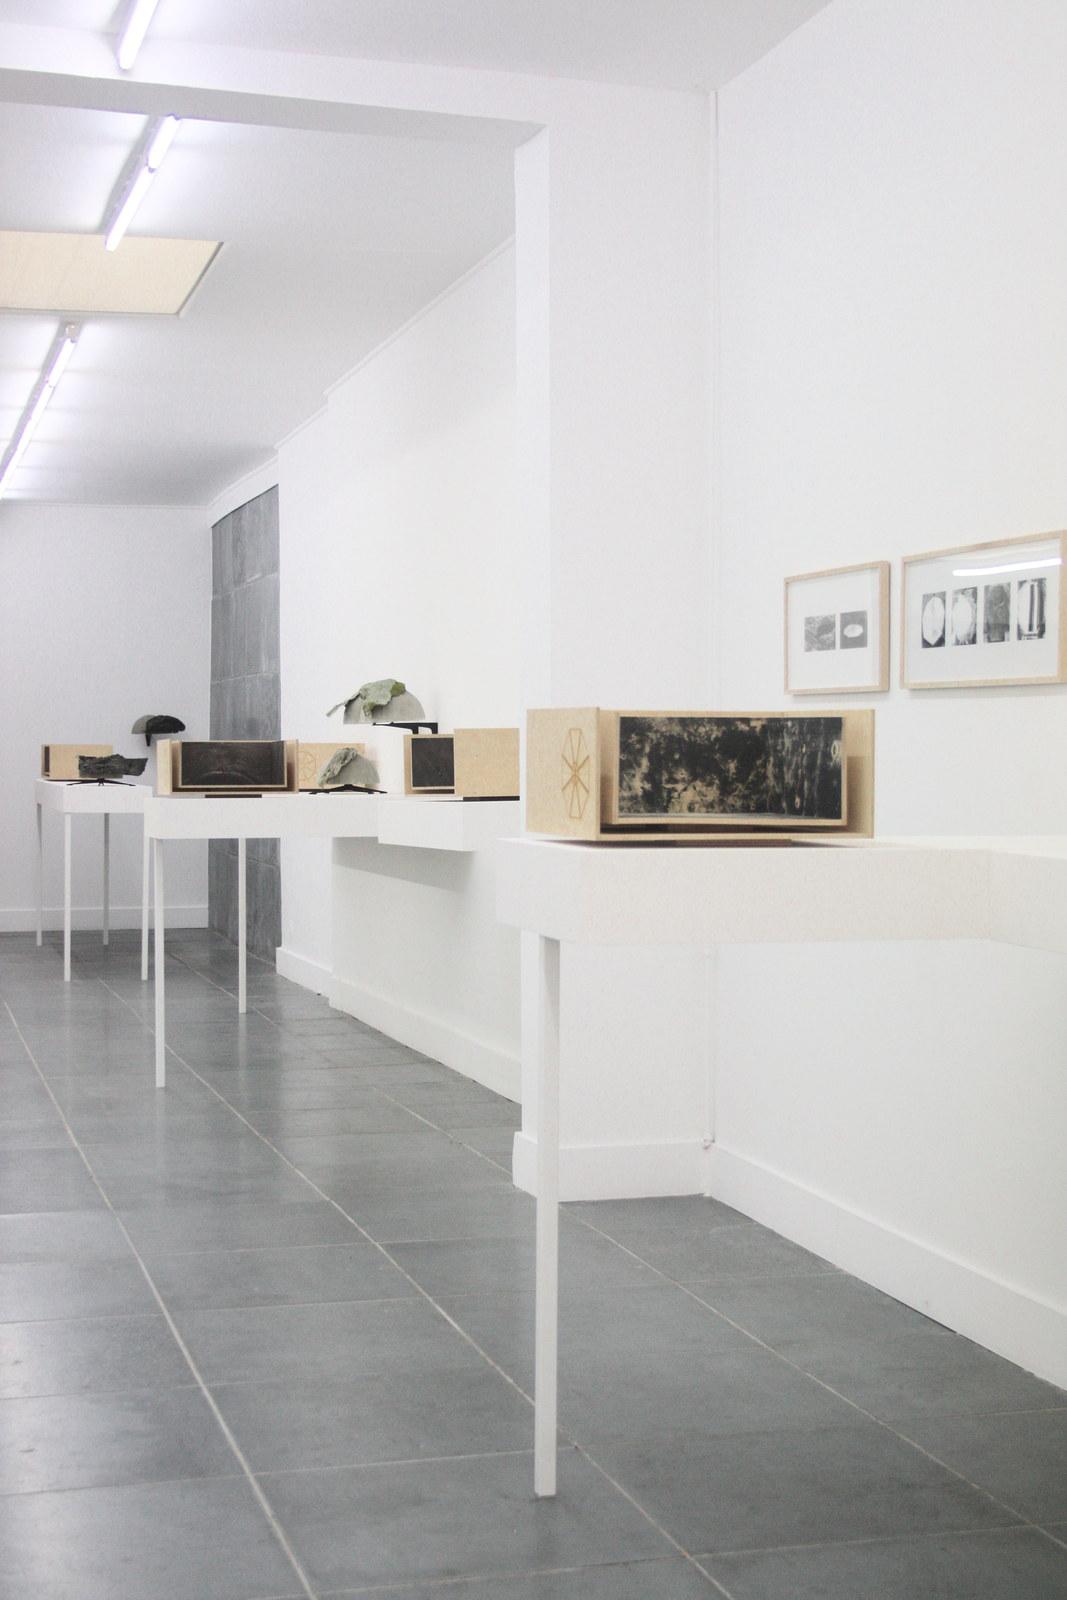 Katleen Vinck, Fractal, installation view